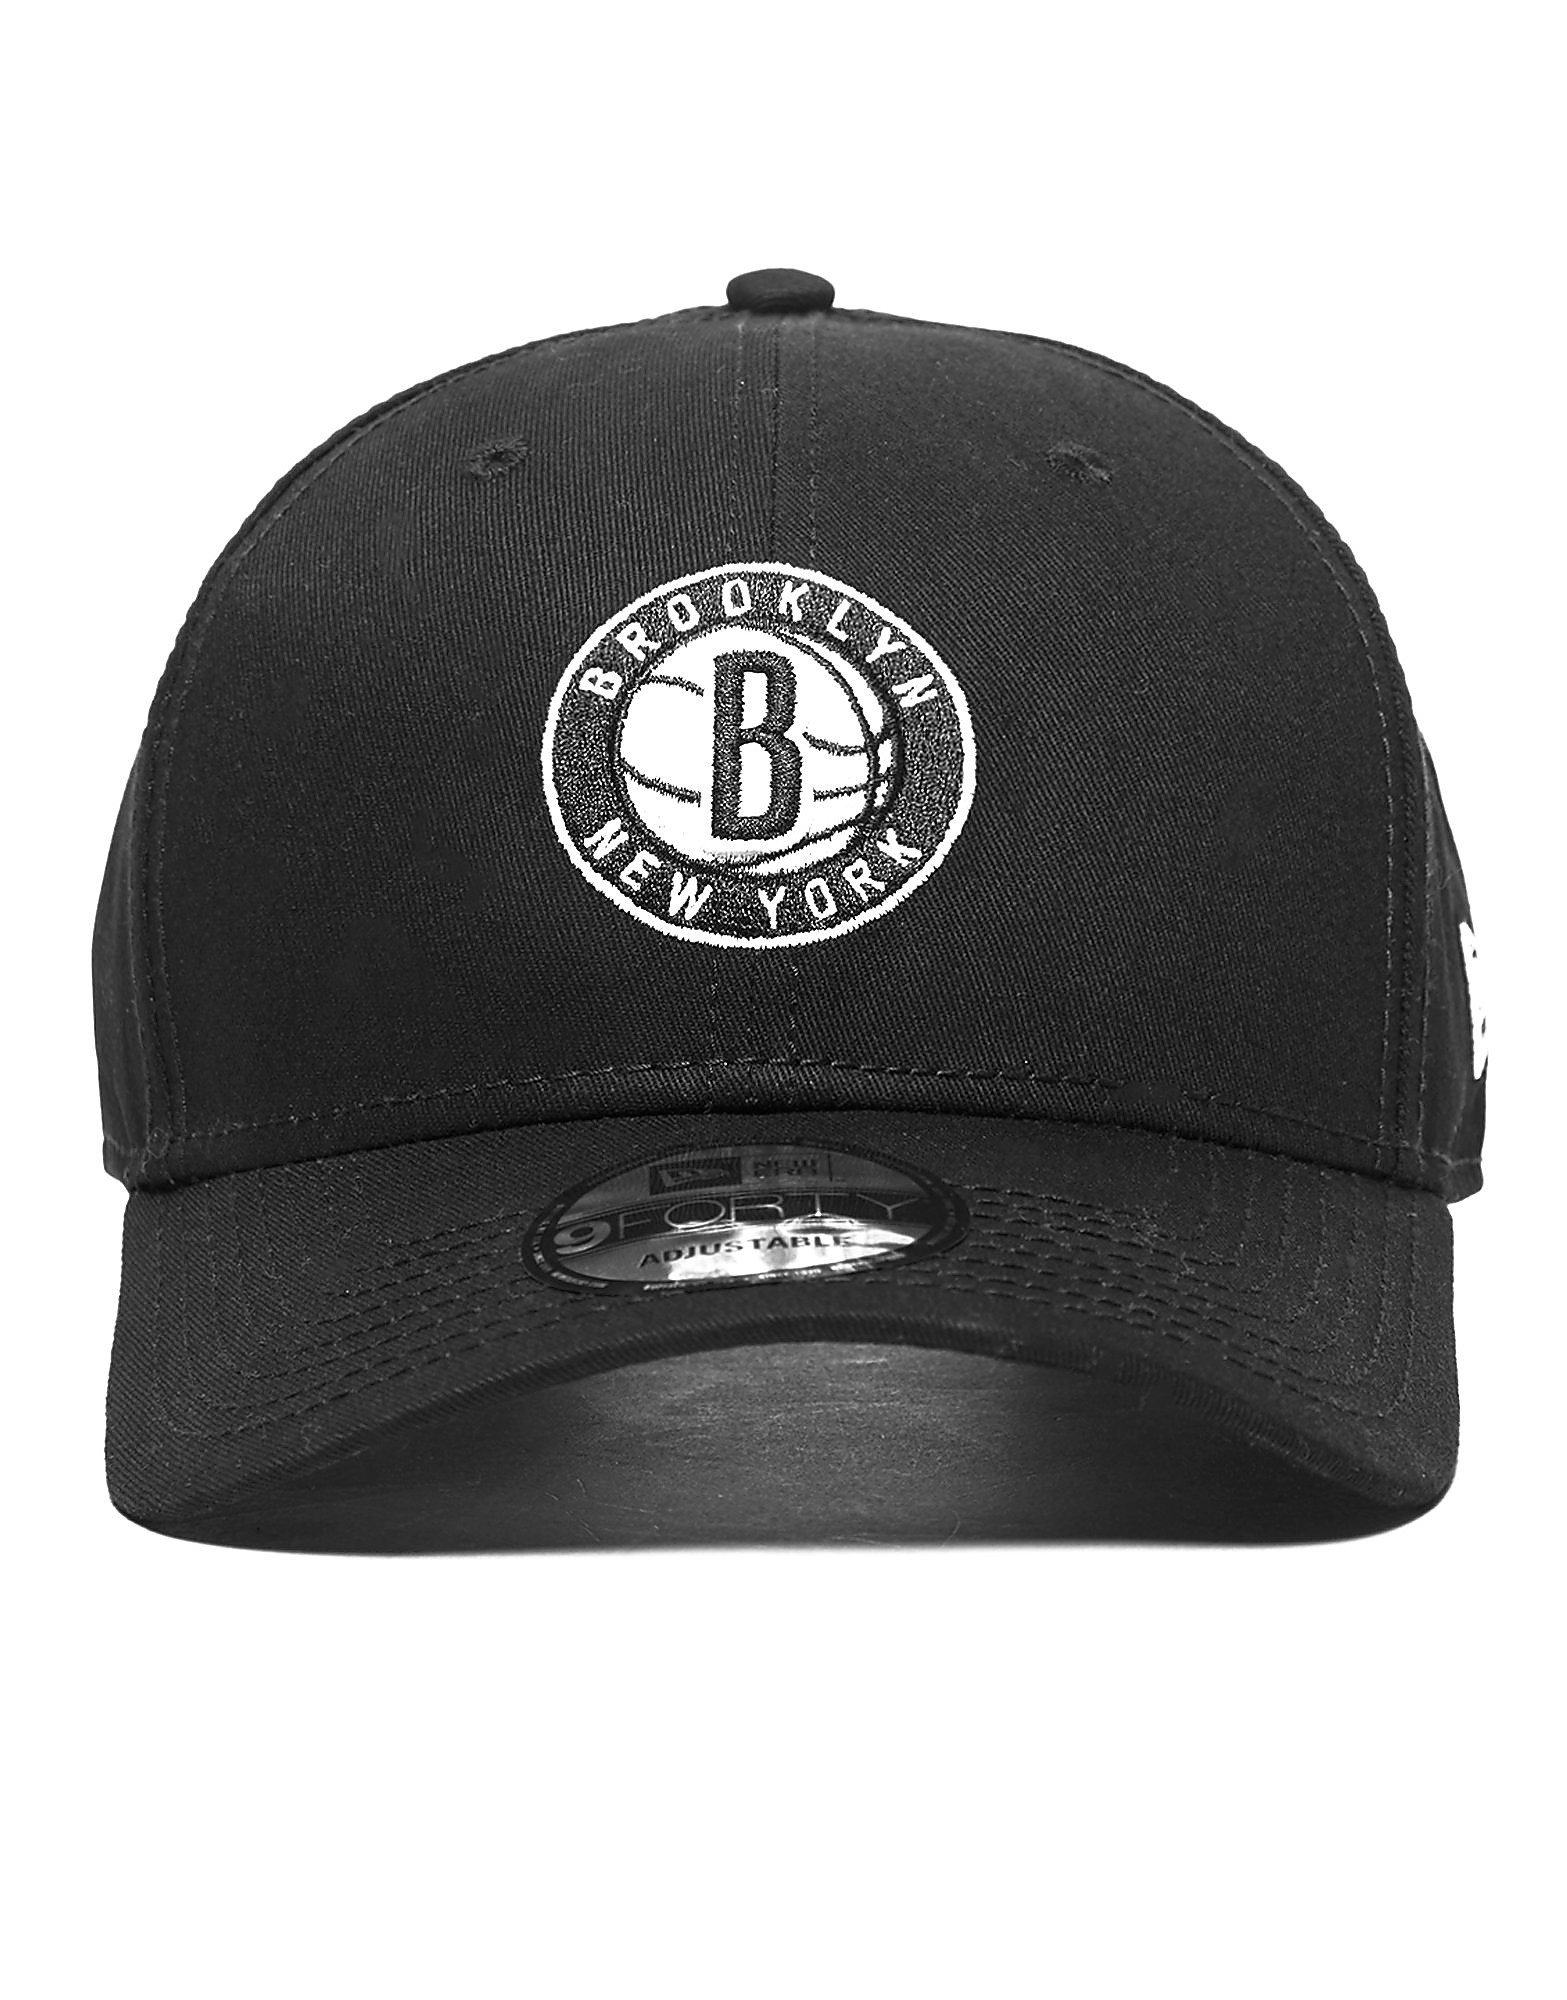 New Era 9FORTY NBA Brooklyn Nets Cap